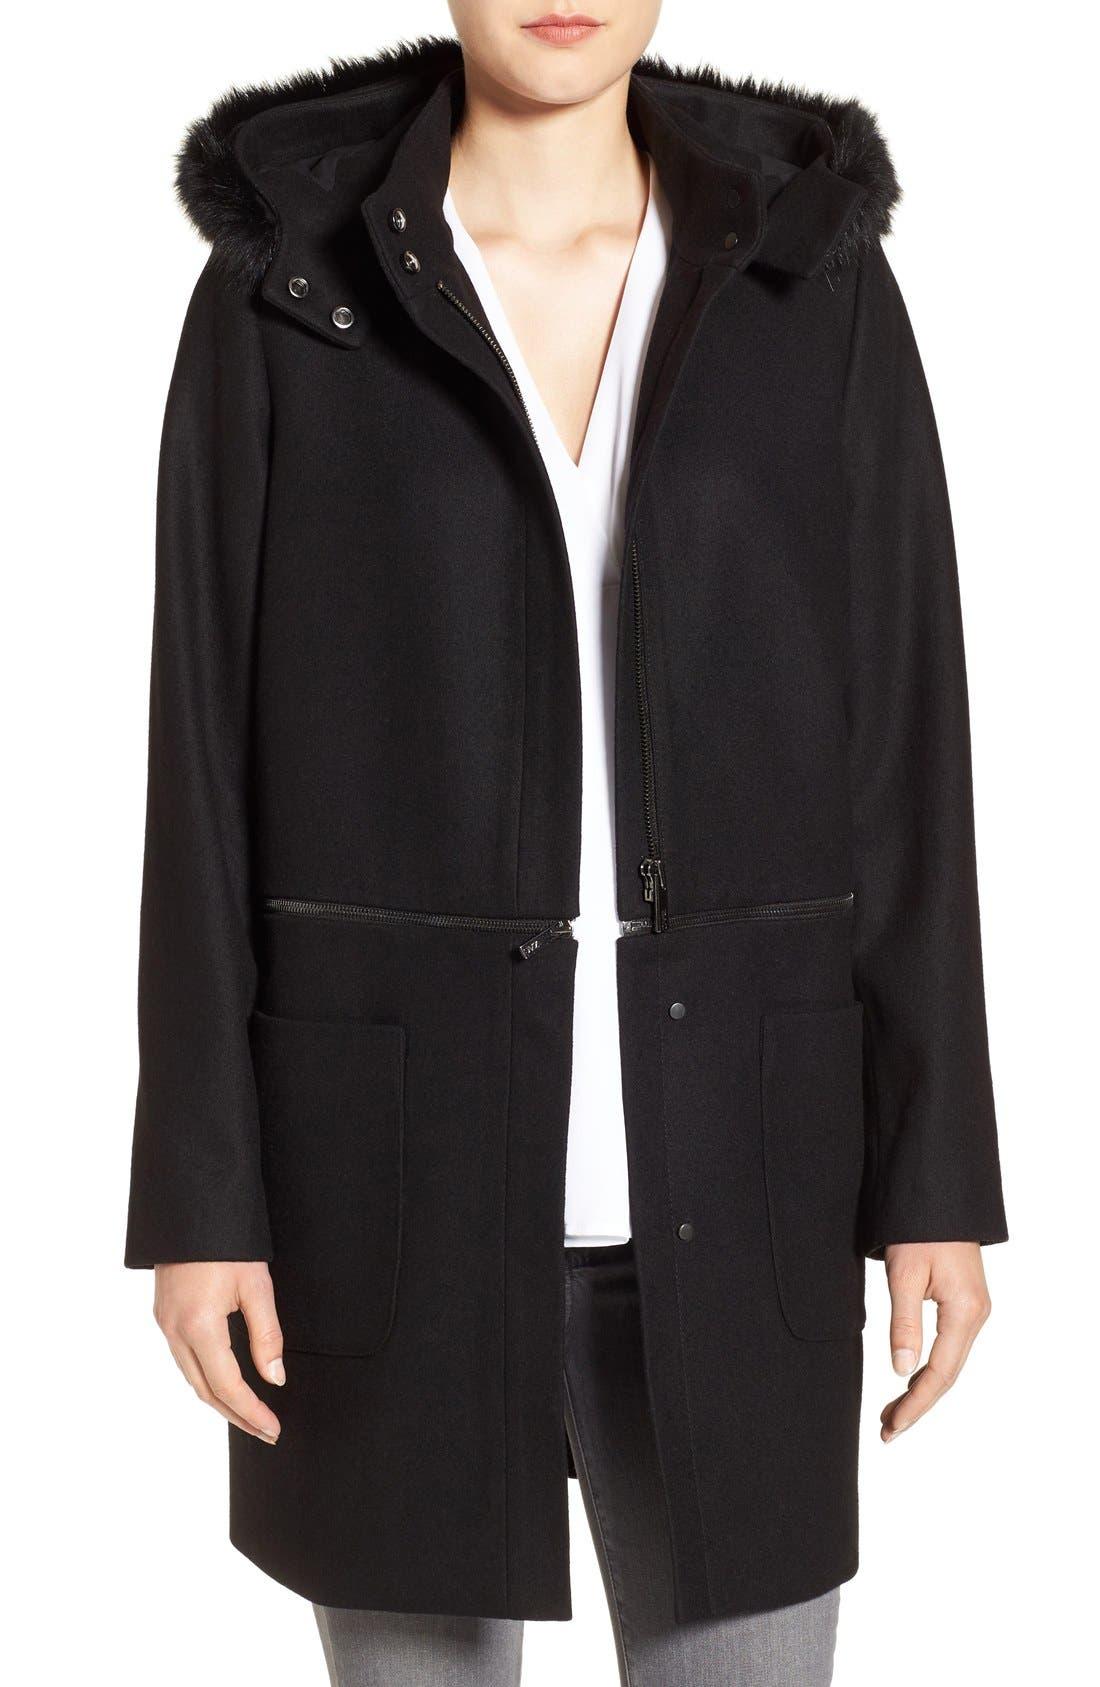 Zac Zac Posen Convertible Faux Fur Trim Wool Blend Coat